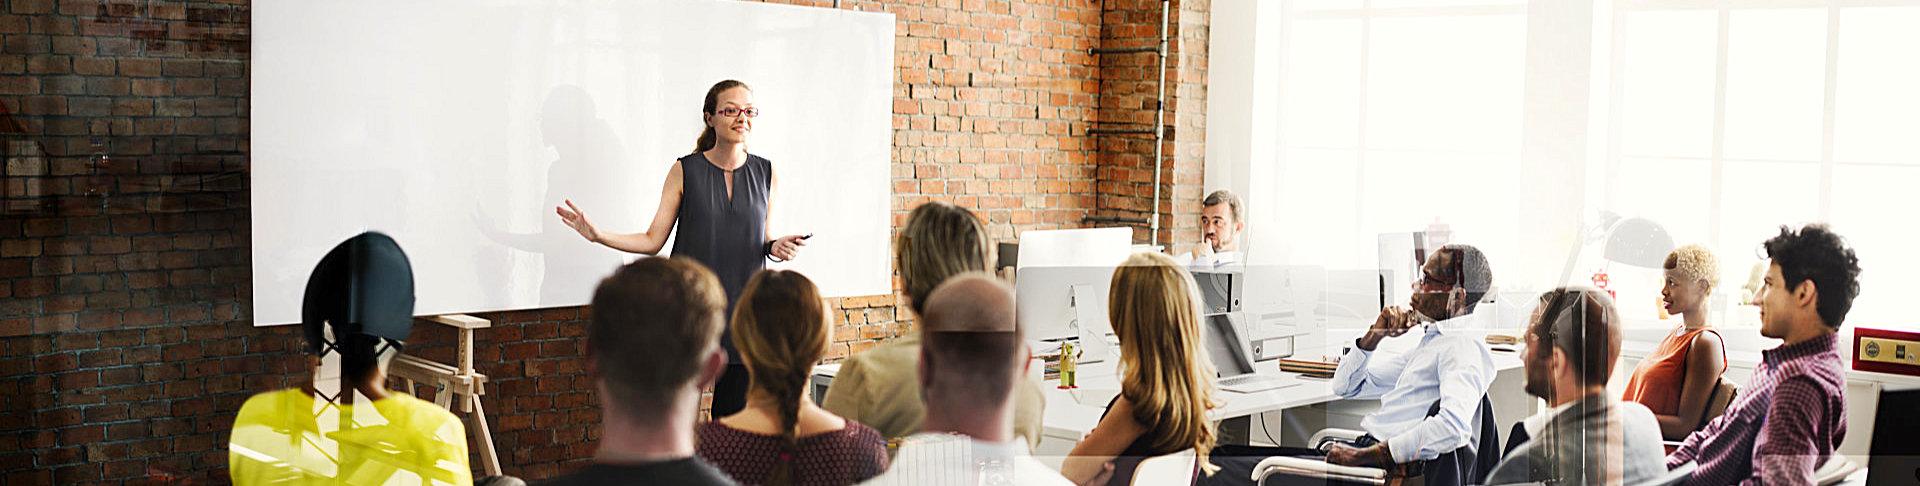 woman having a presentation